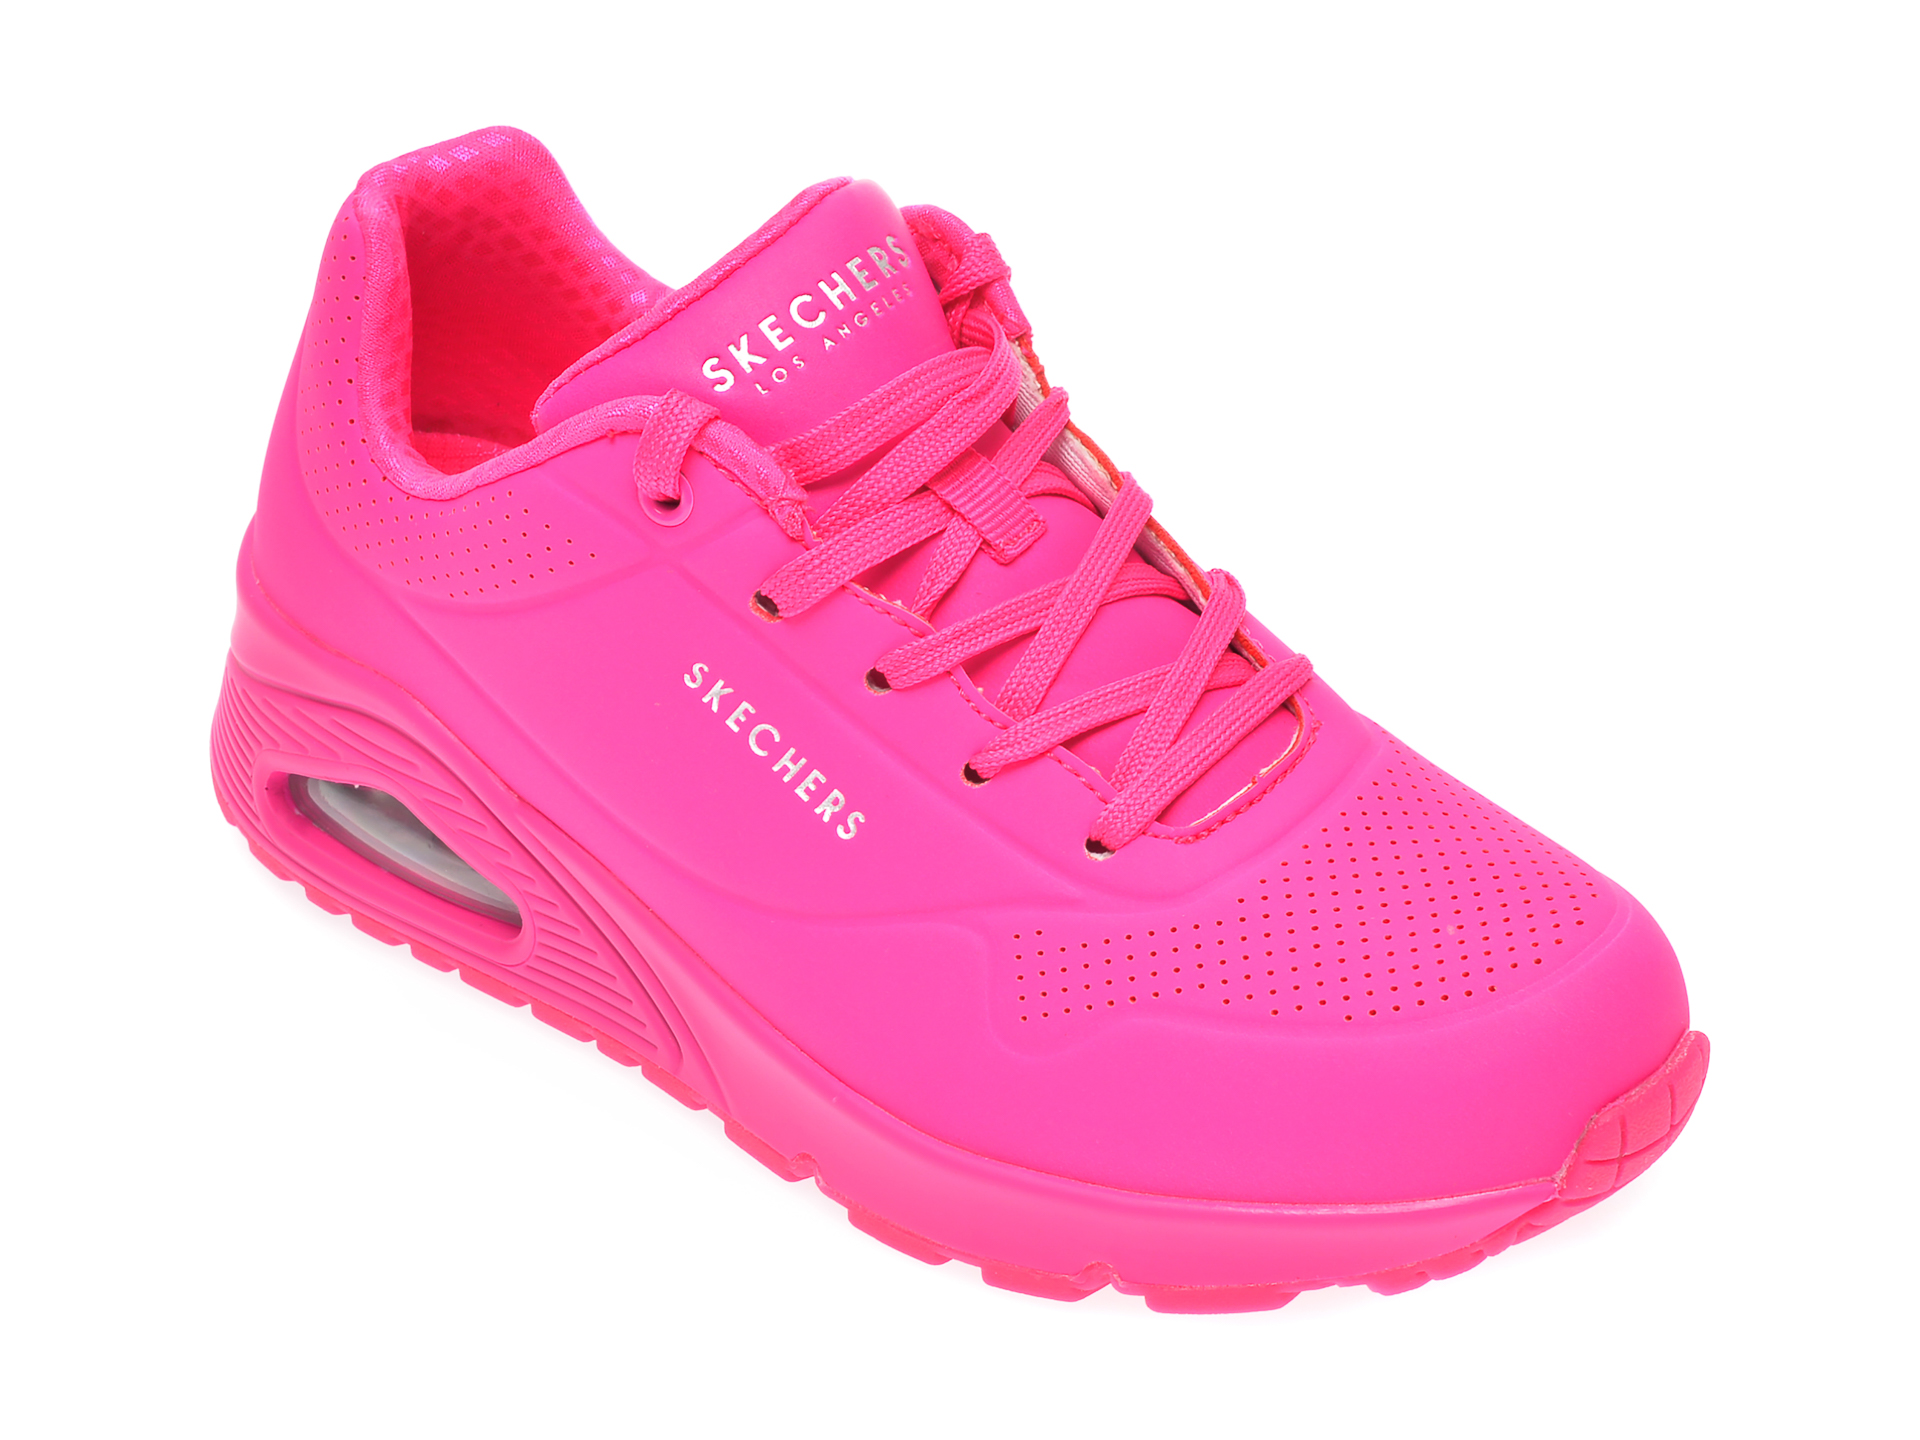 Pantofi sport SKECHERS roz, Uno Night Shades, din piele ecologica New